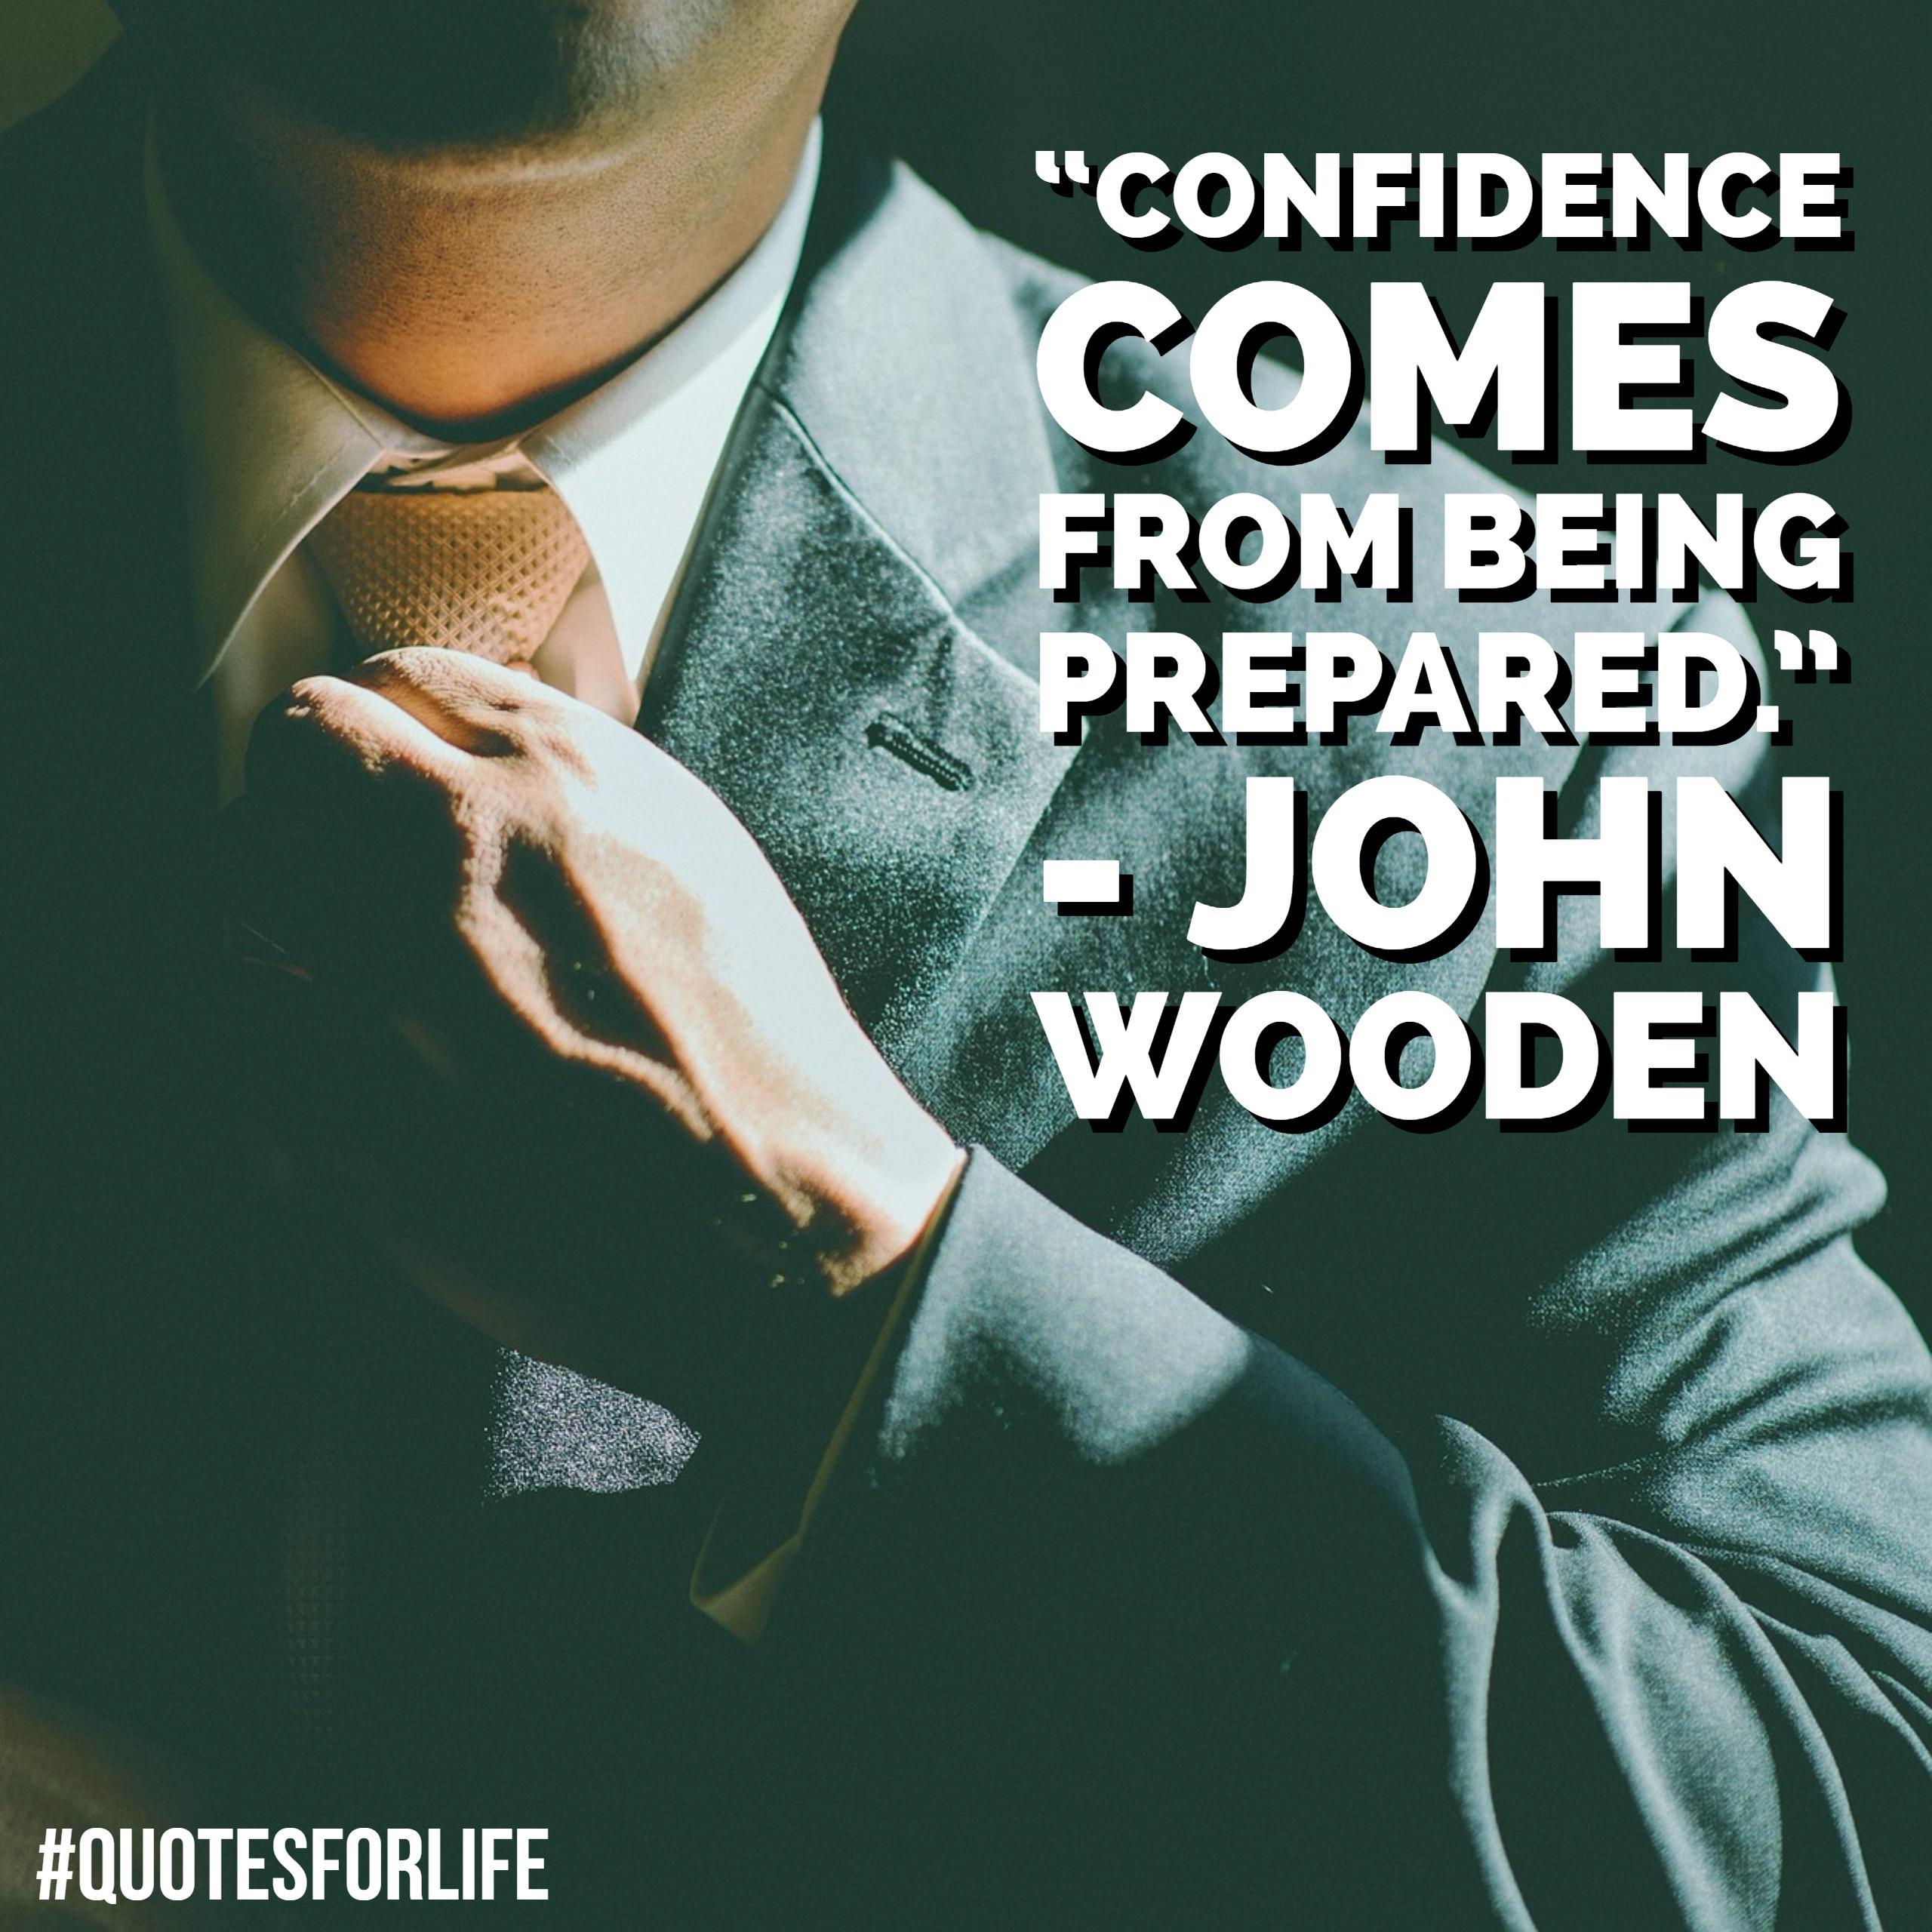 John Wooden